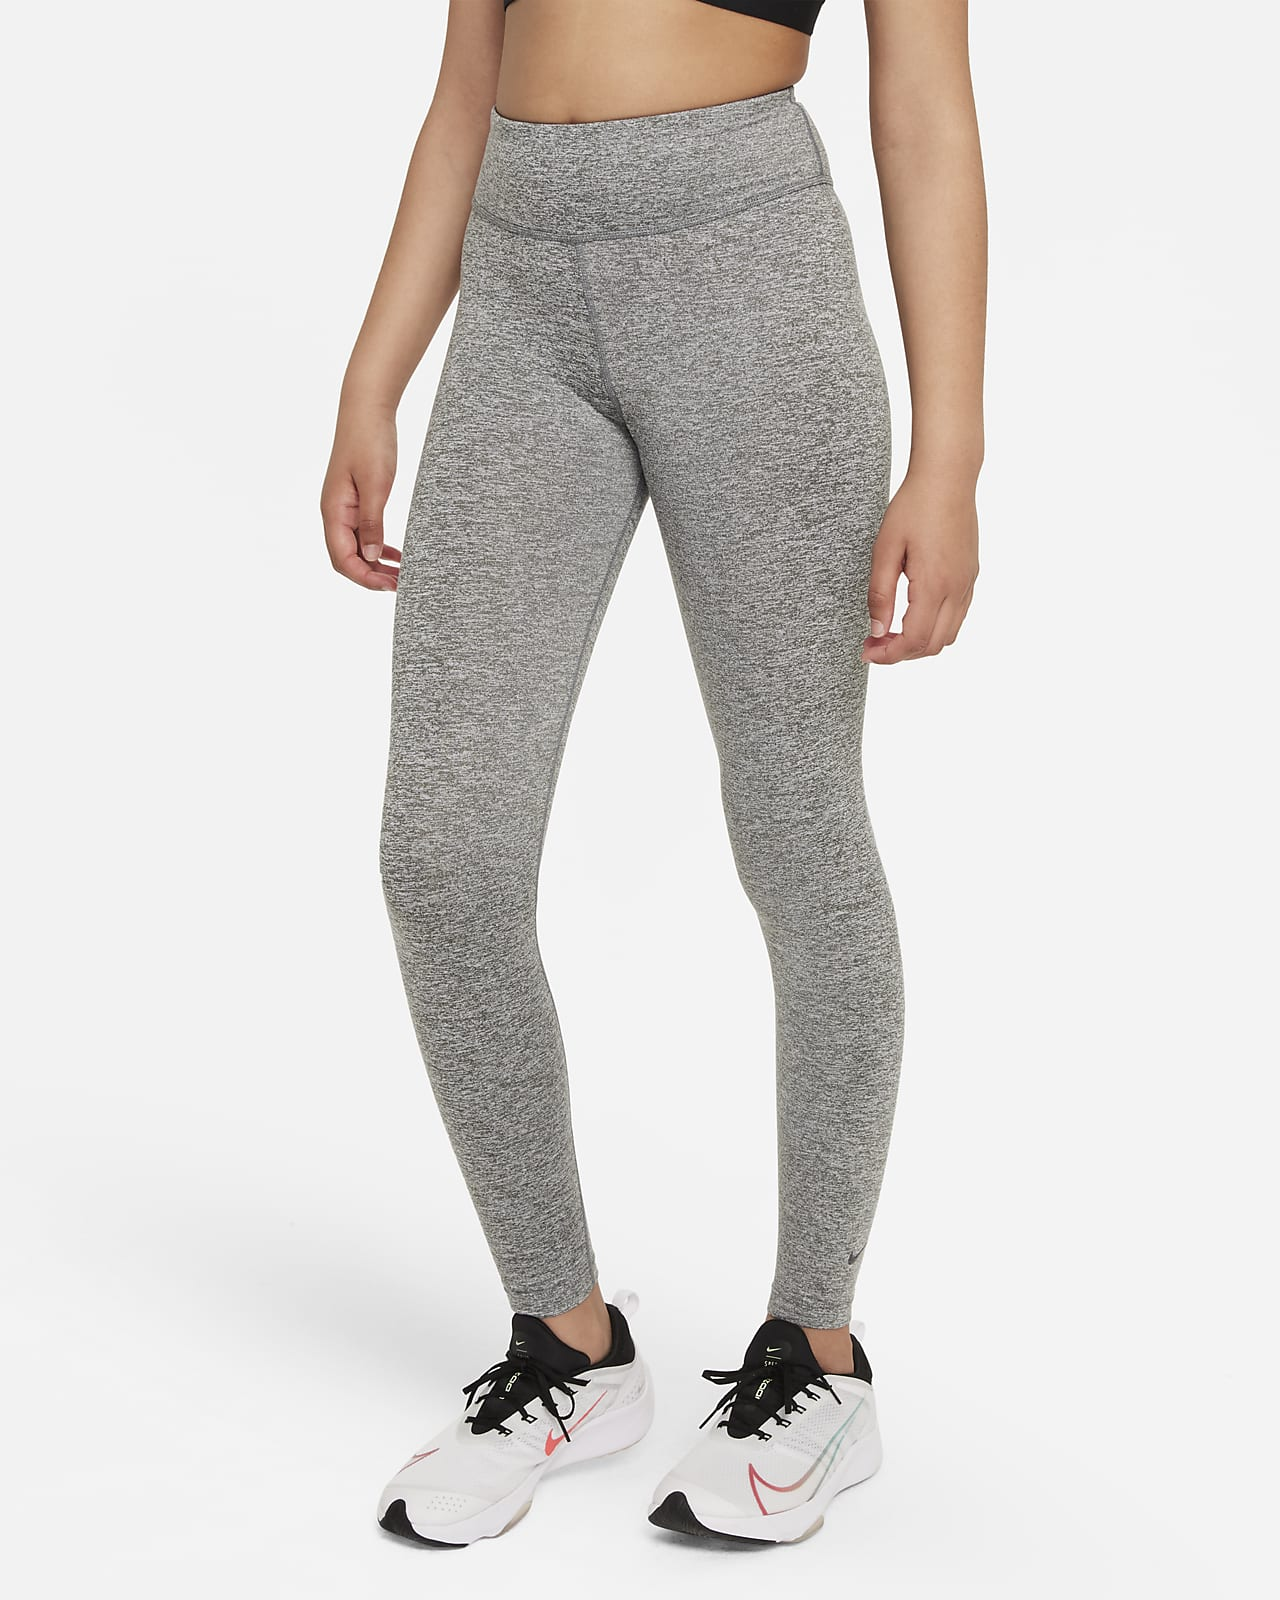 Nike Dri-FIT One Luxe Big Kids' (Girls') High-Rise Leggings